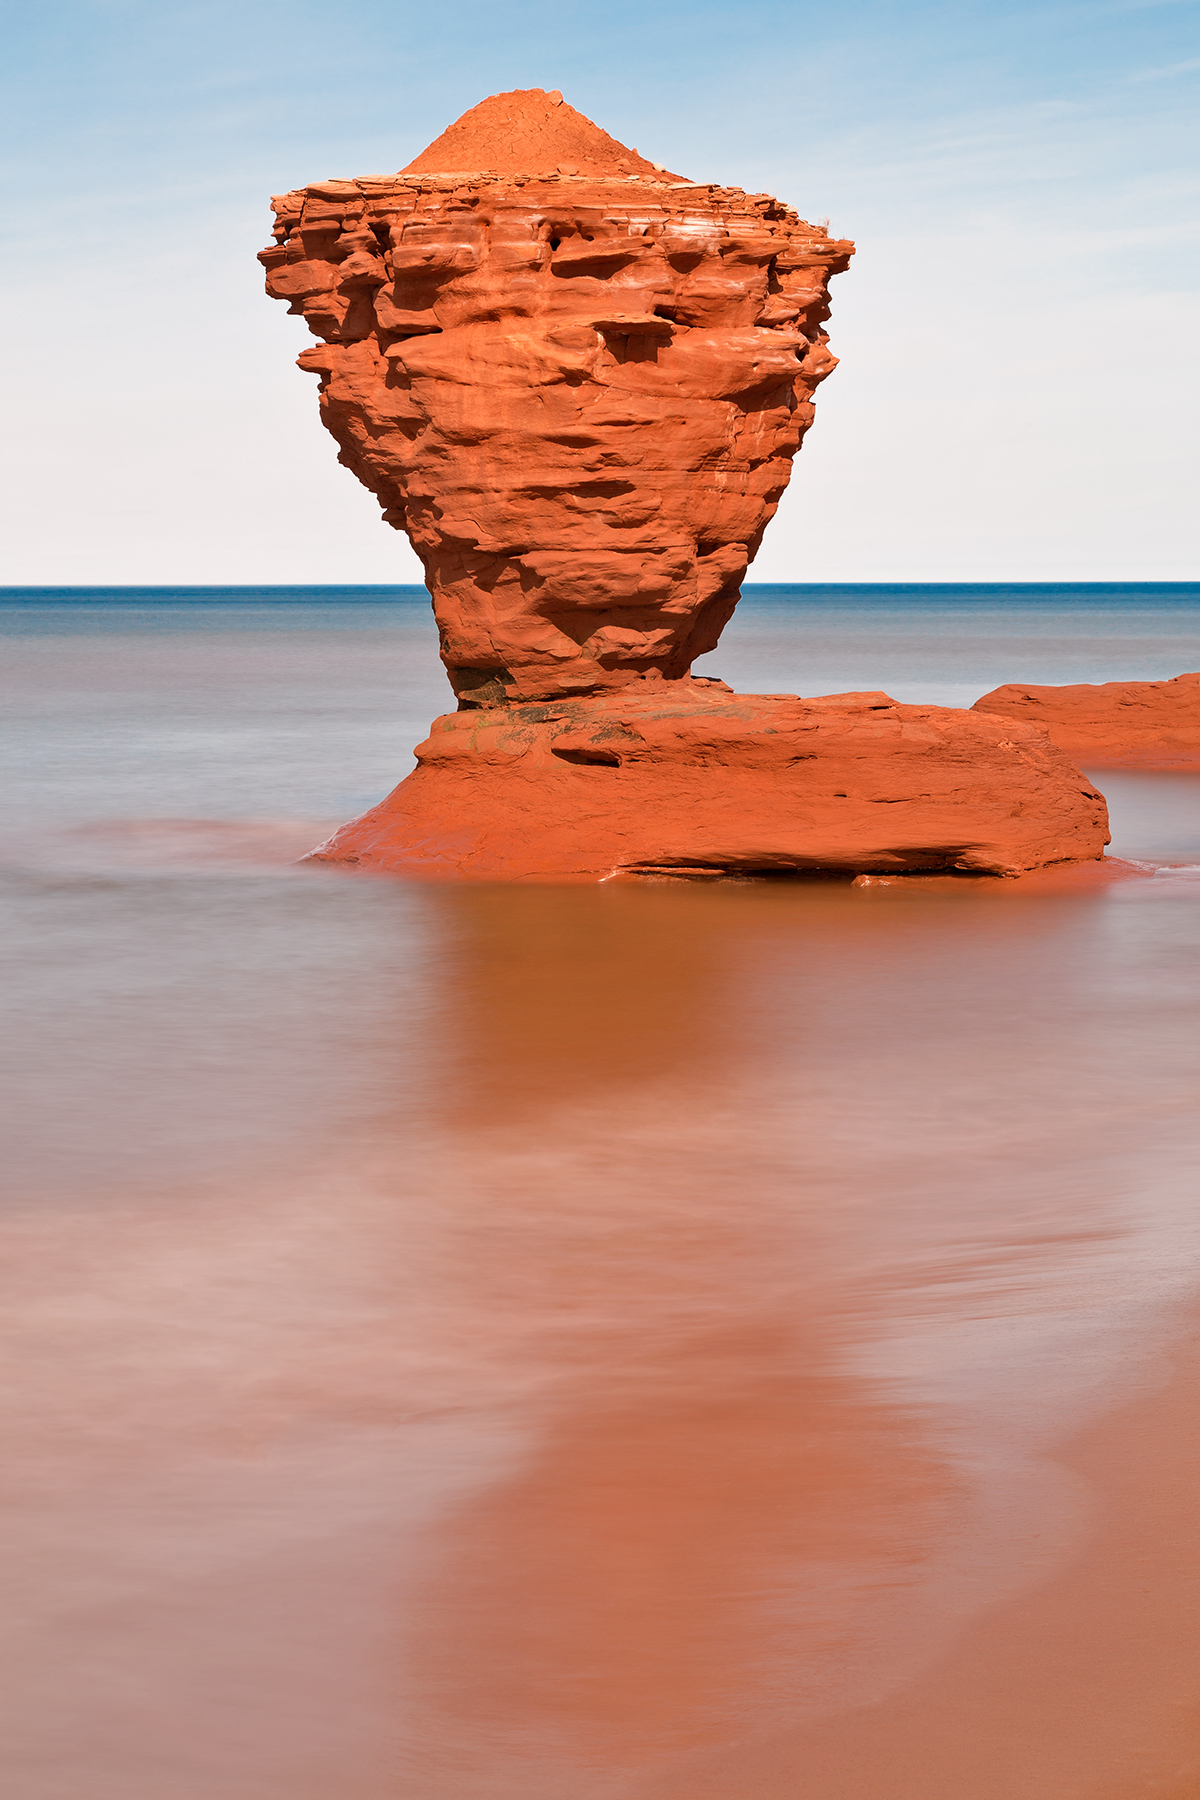 Teapot Rock, Rocks, Rocky, Rock, Red, HQ Photo